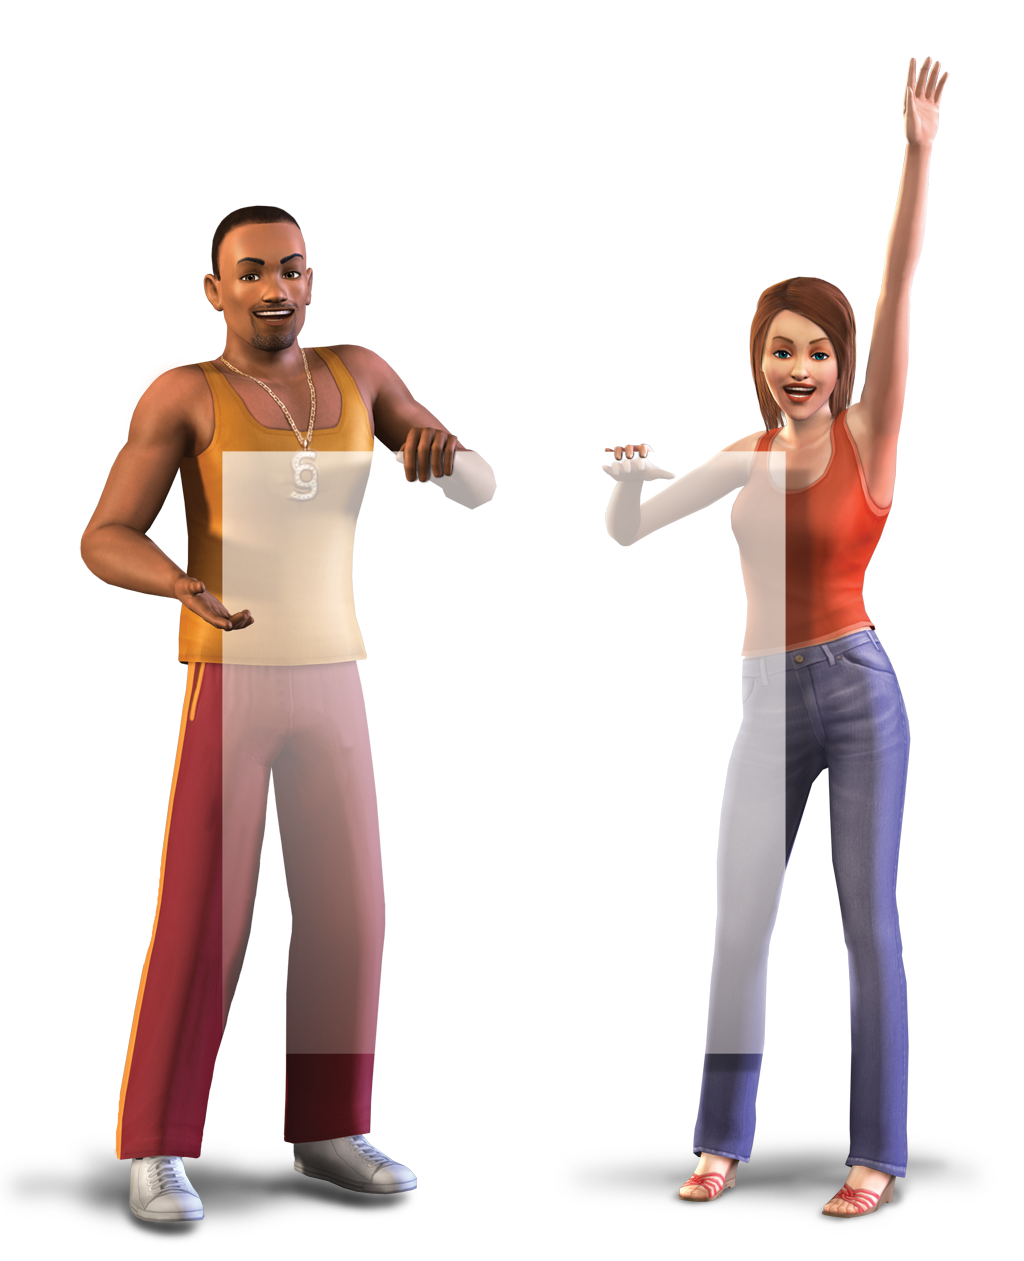 Sims 3 porn bsdm smut movies